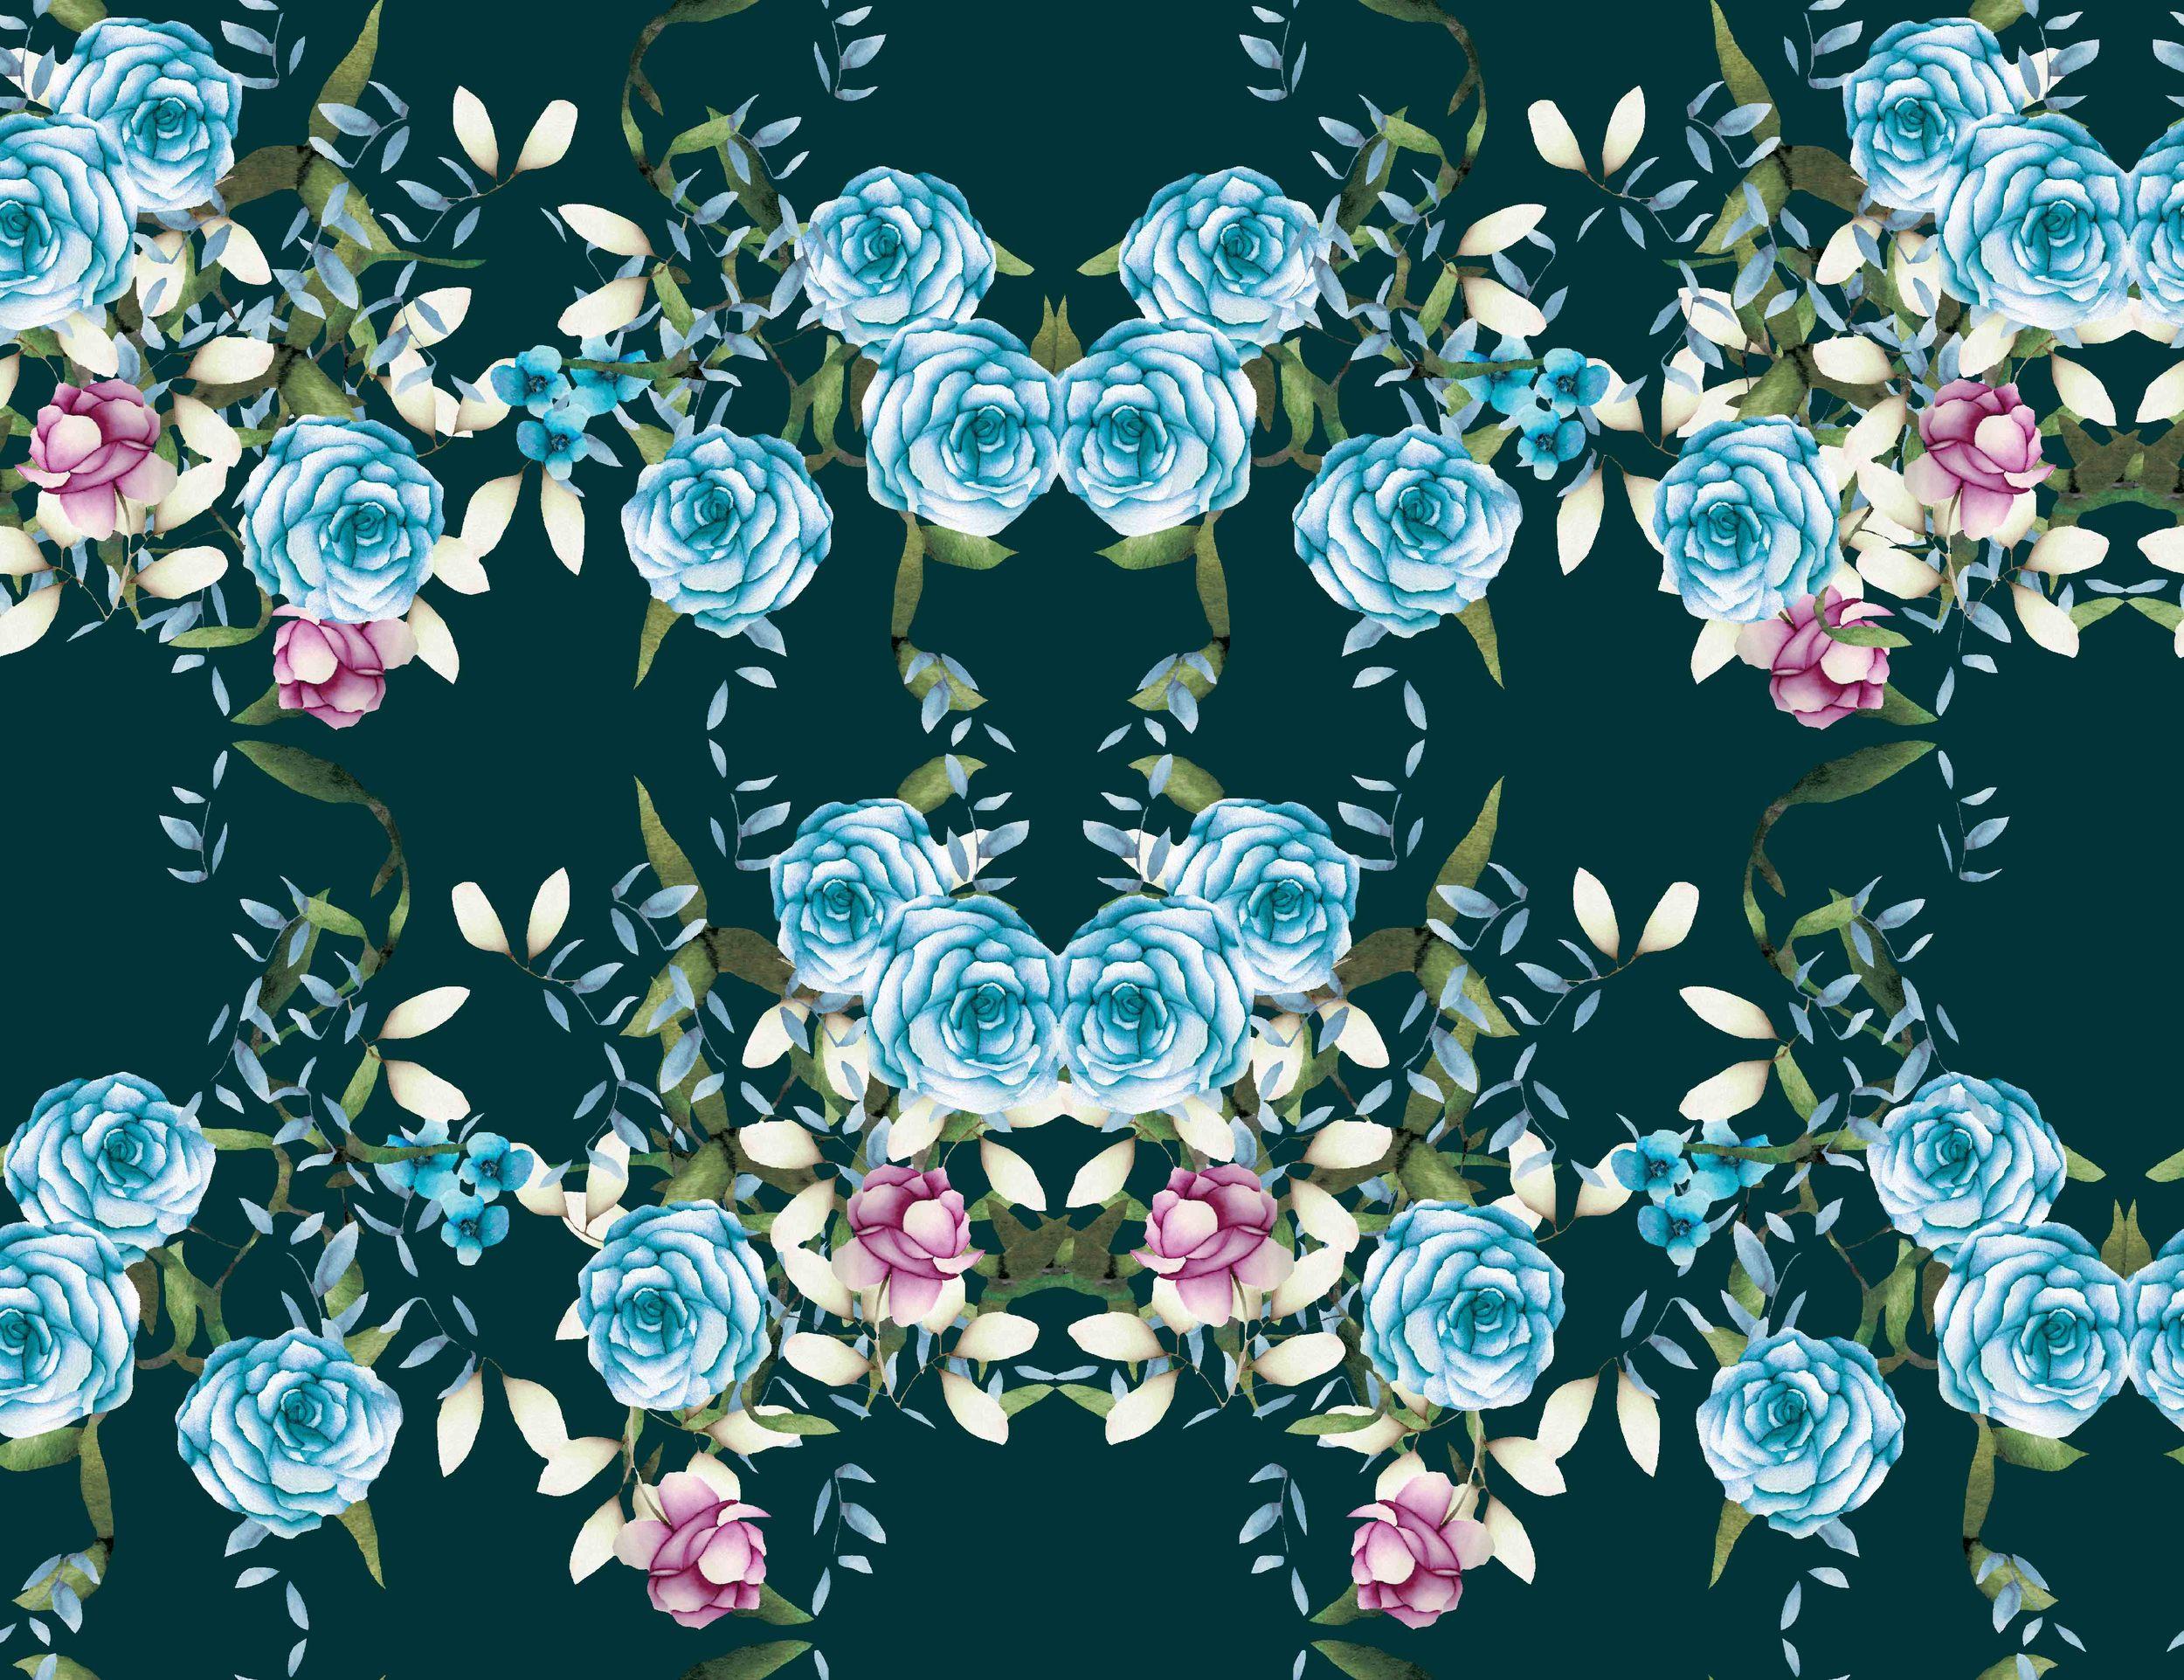 detail_ckd fall 15 copy.jpg